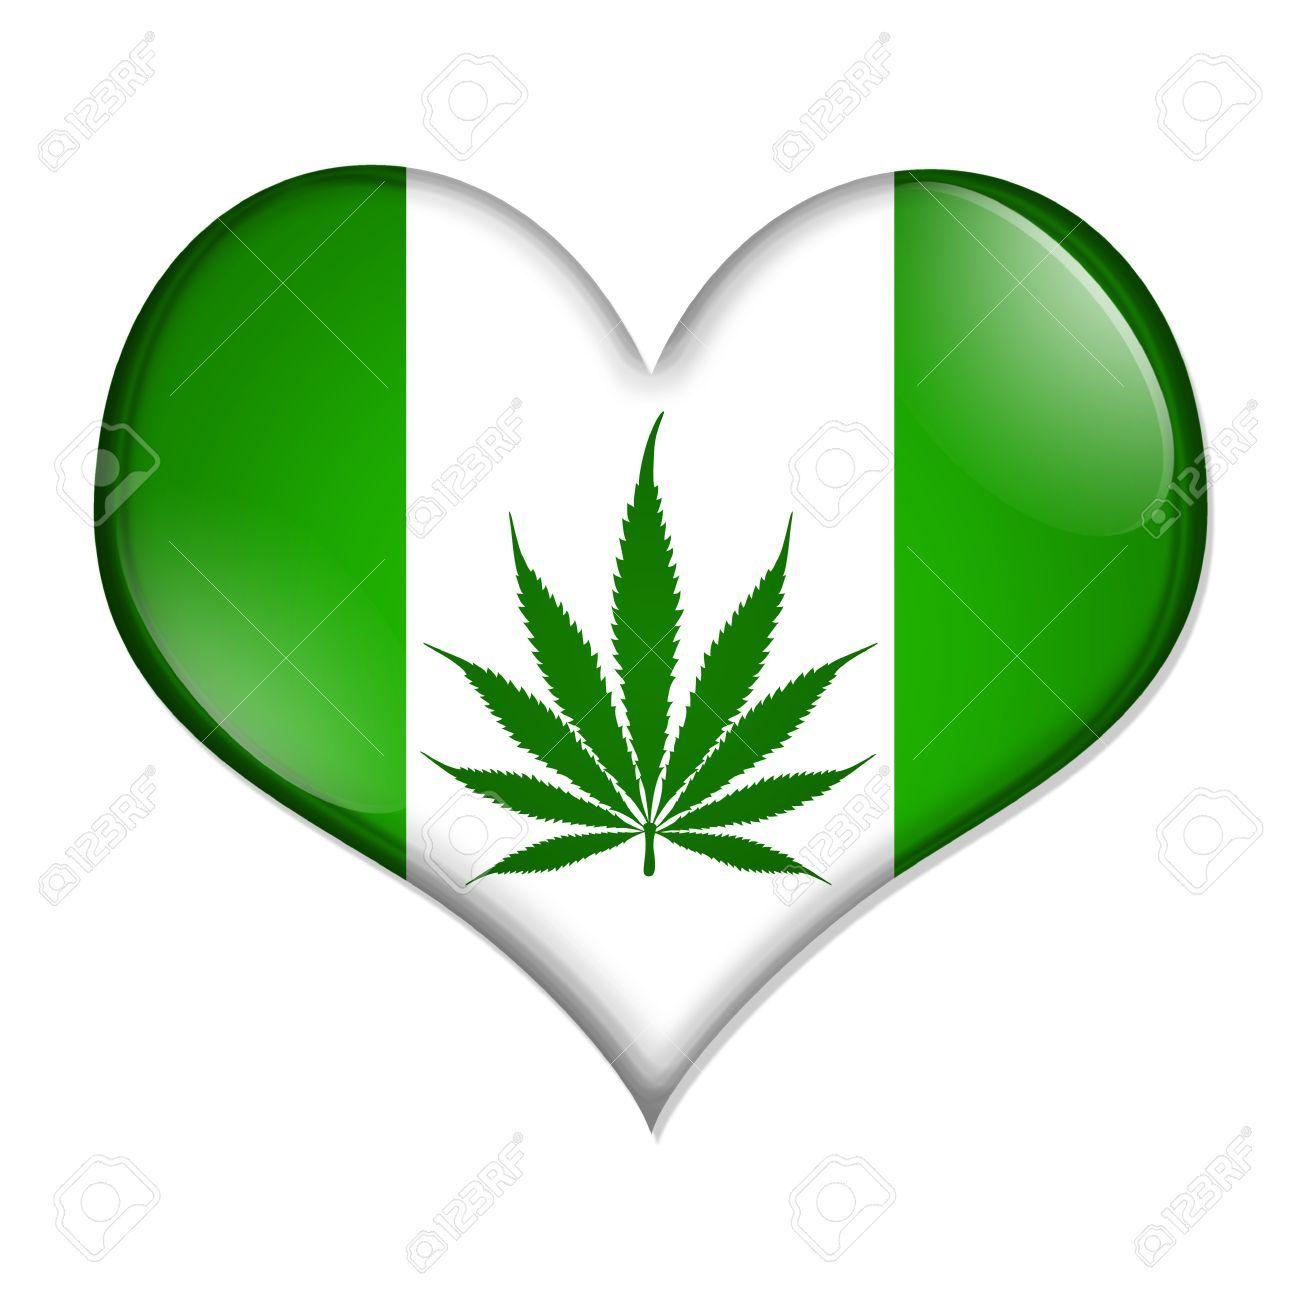 Dibujos Corazón Imagenes De Marihuana Chidas Wwwmiifotoscom